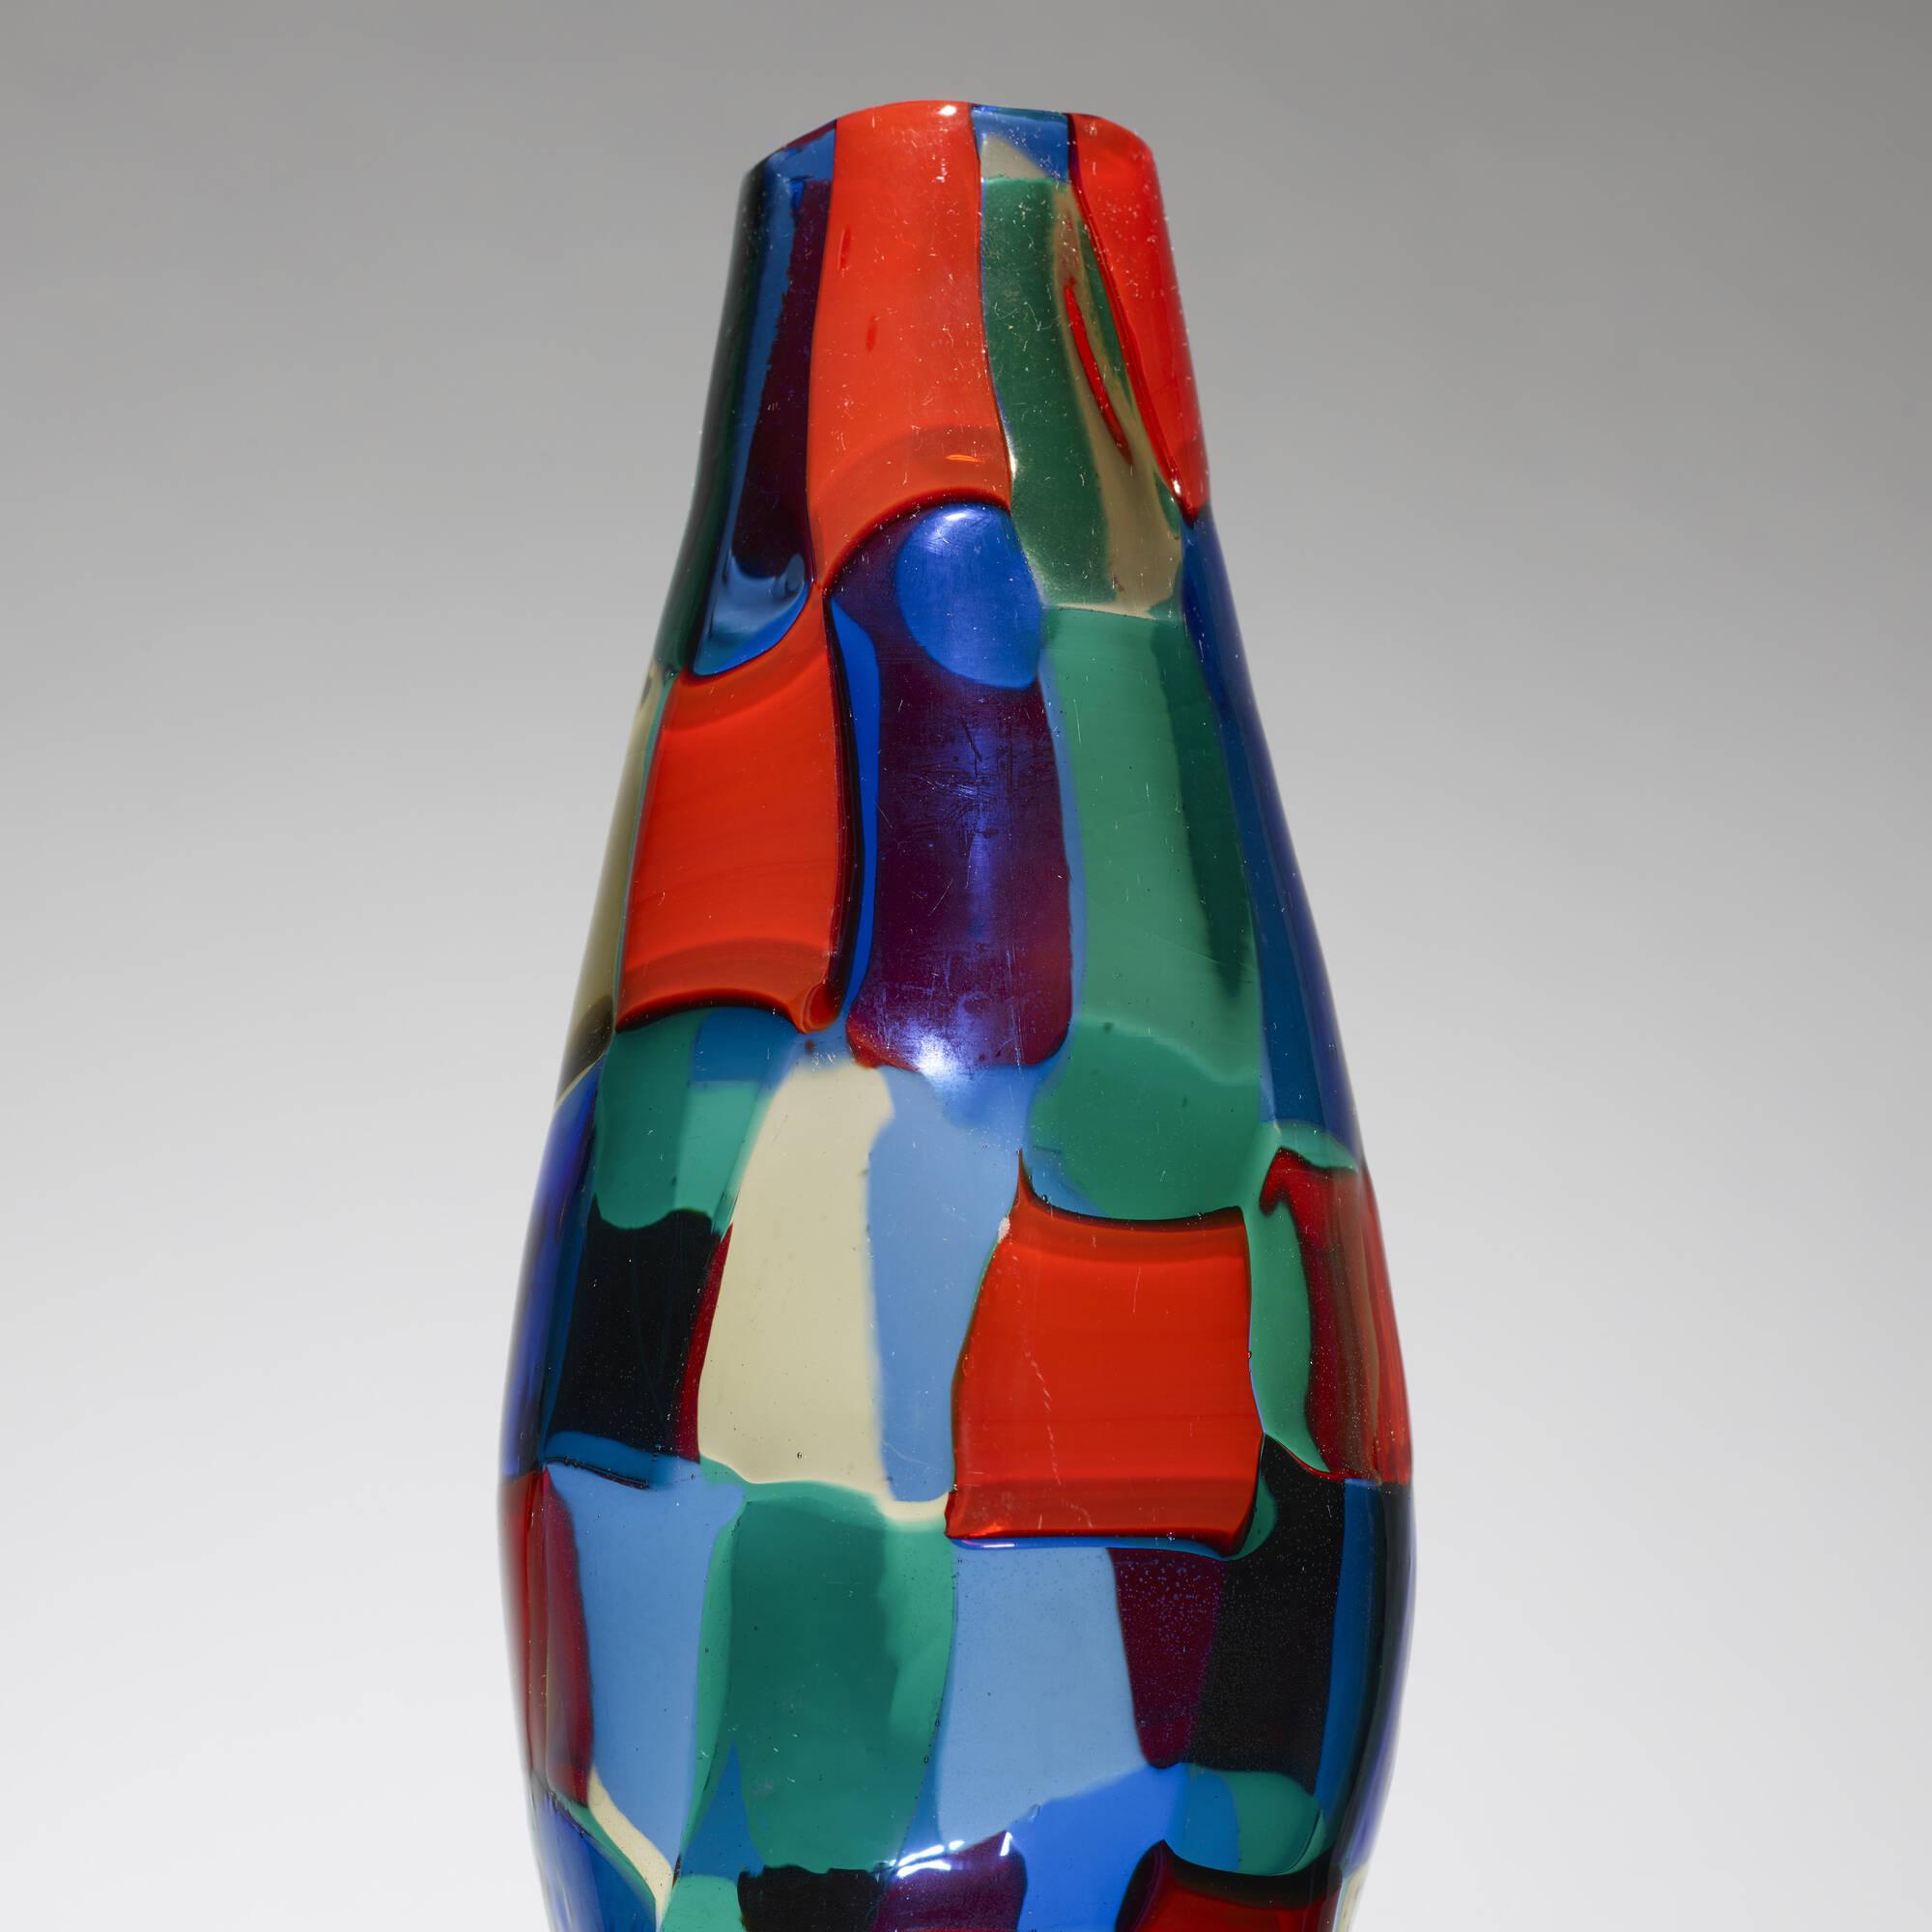 141: Fulvio Bianconi / Pezzato vase (3 of 4)